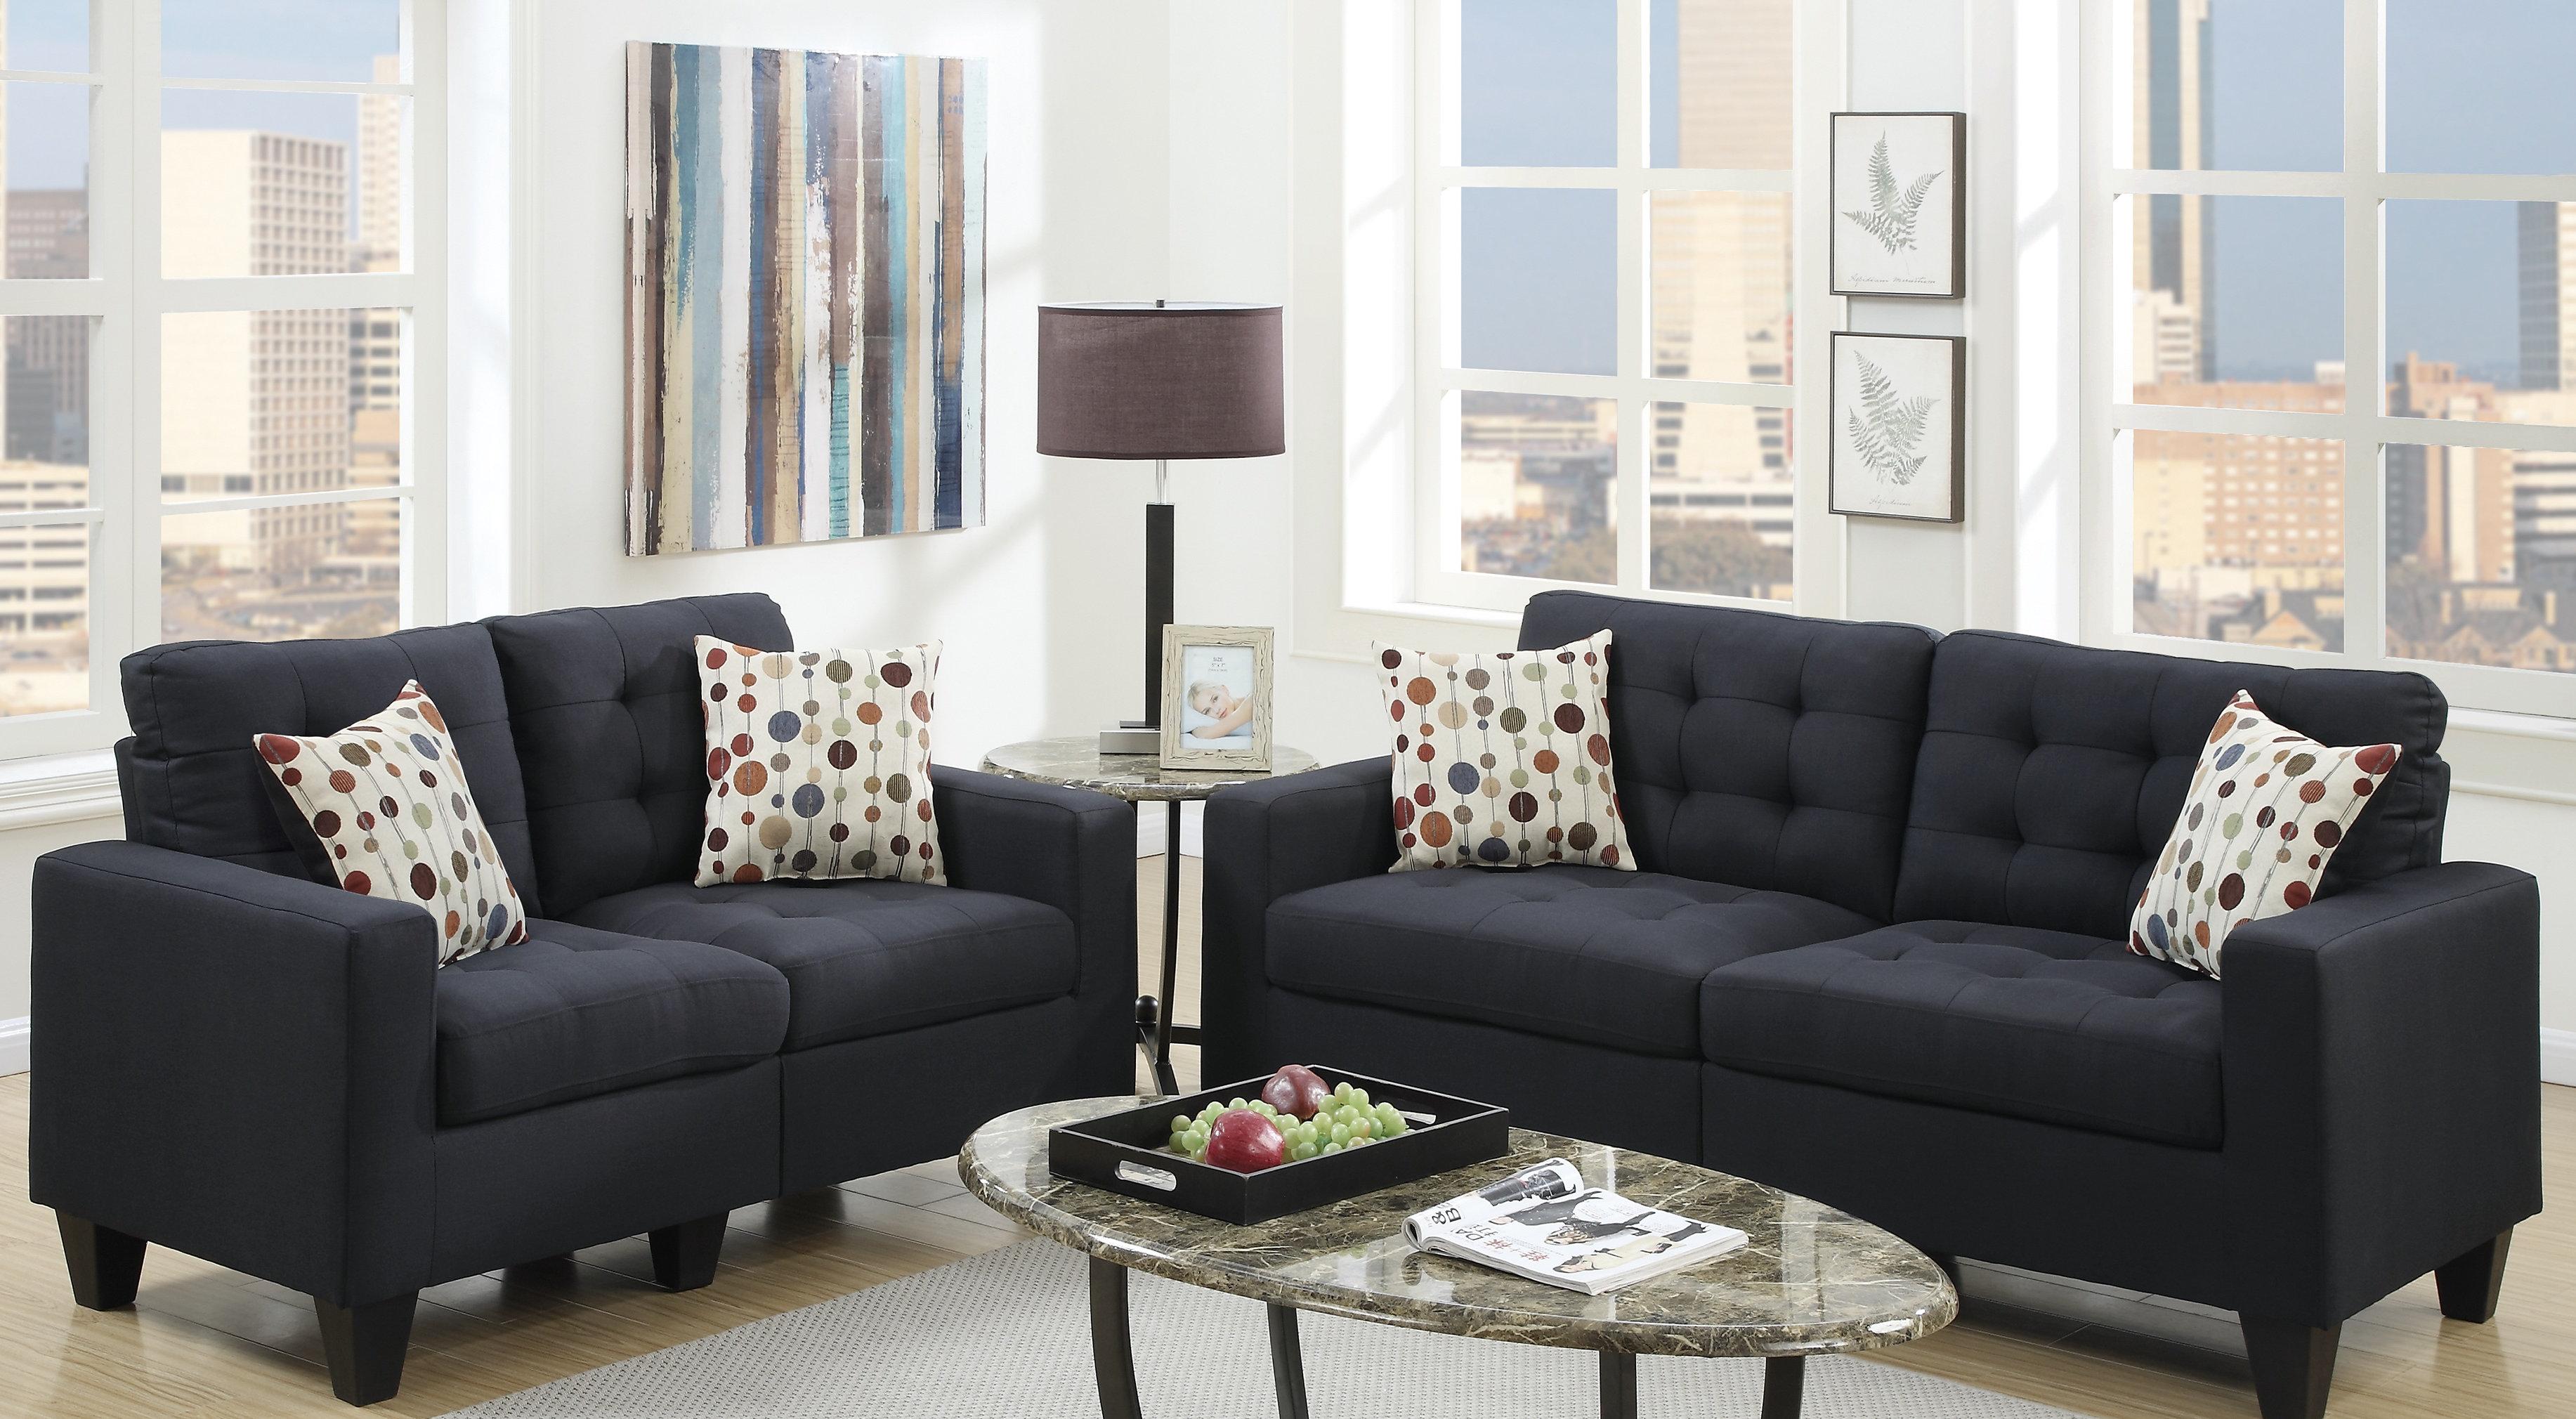 callanan 2 piece living room set